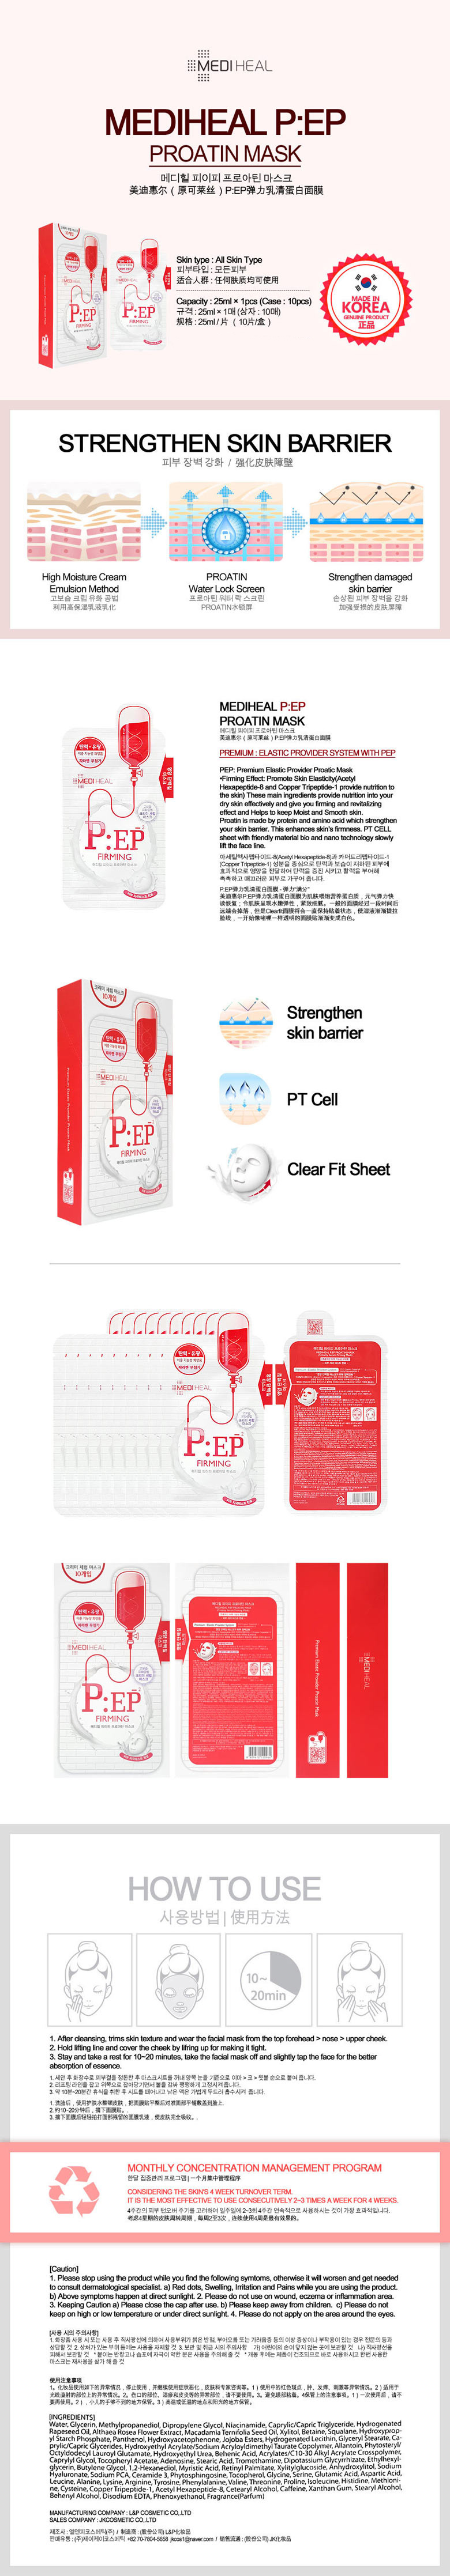 Mediheal Premium Elastic Provider Proatin